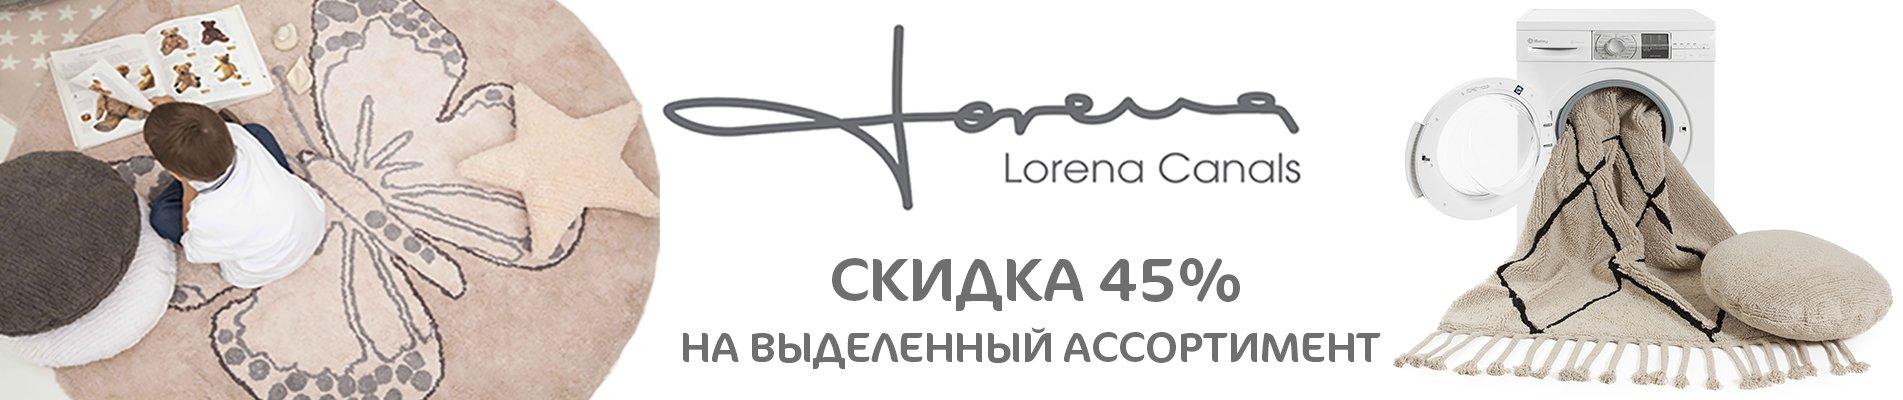 lc-17.01.20